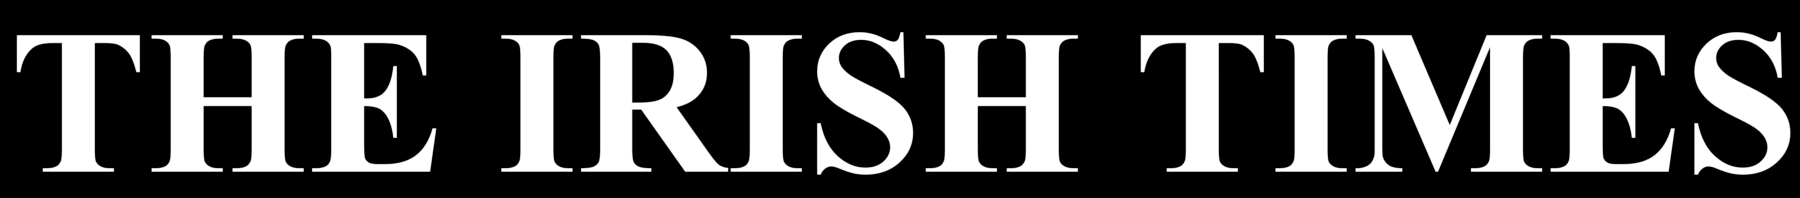 The_Irish_Times_logo_black.png